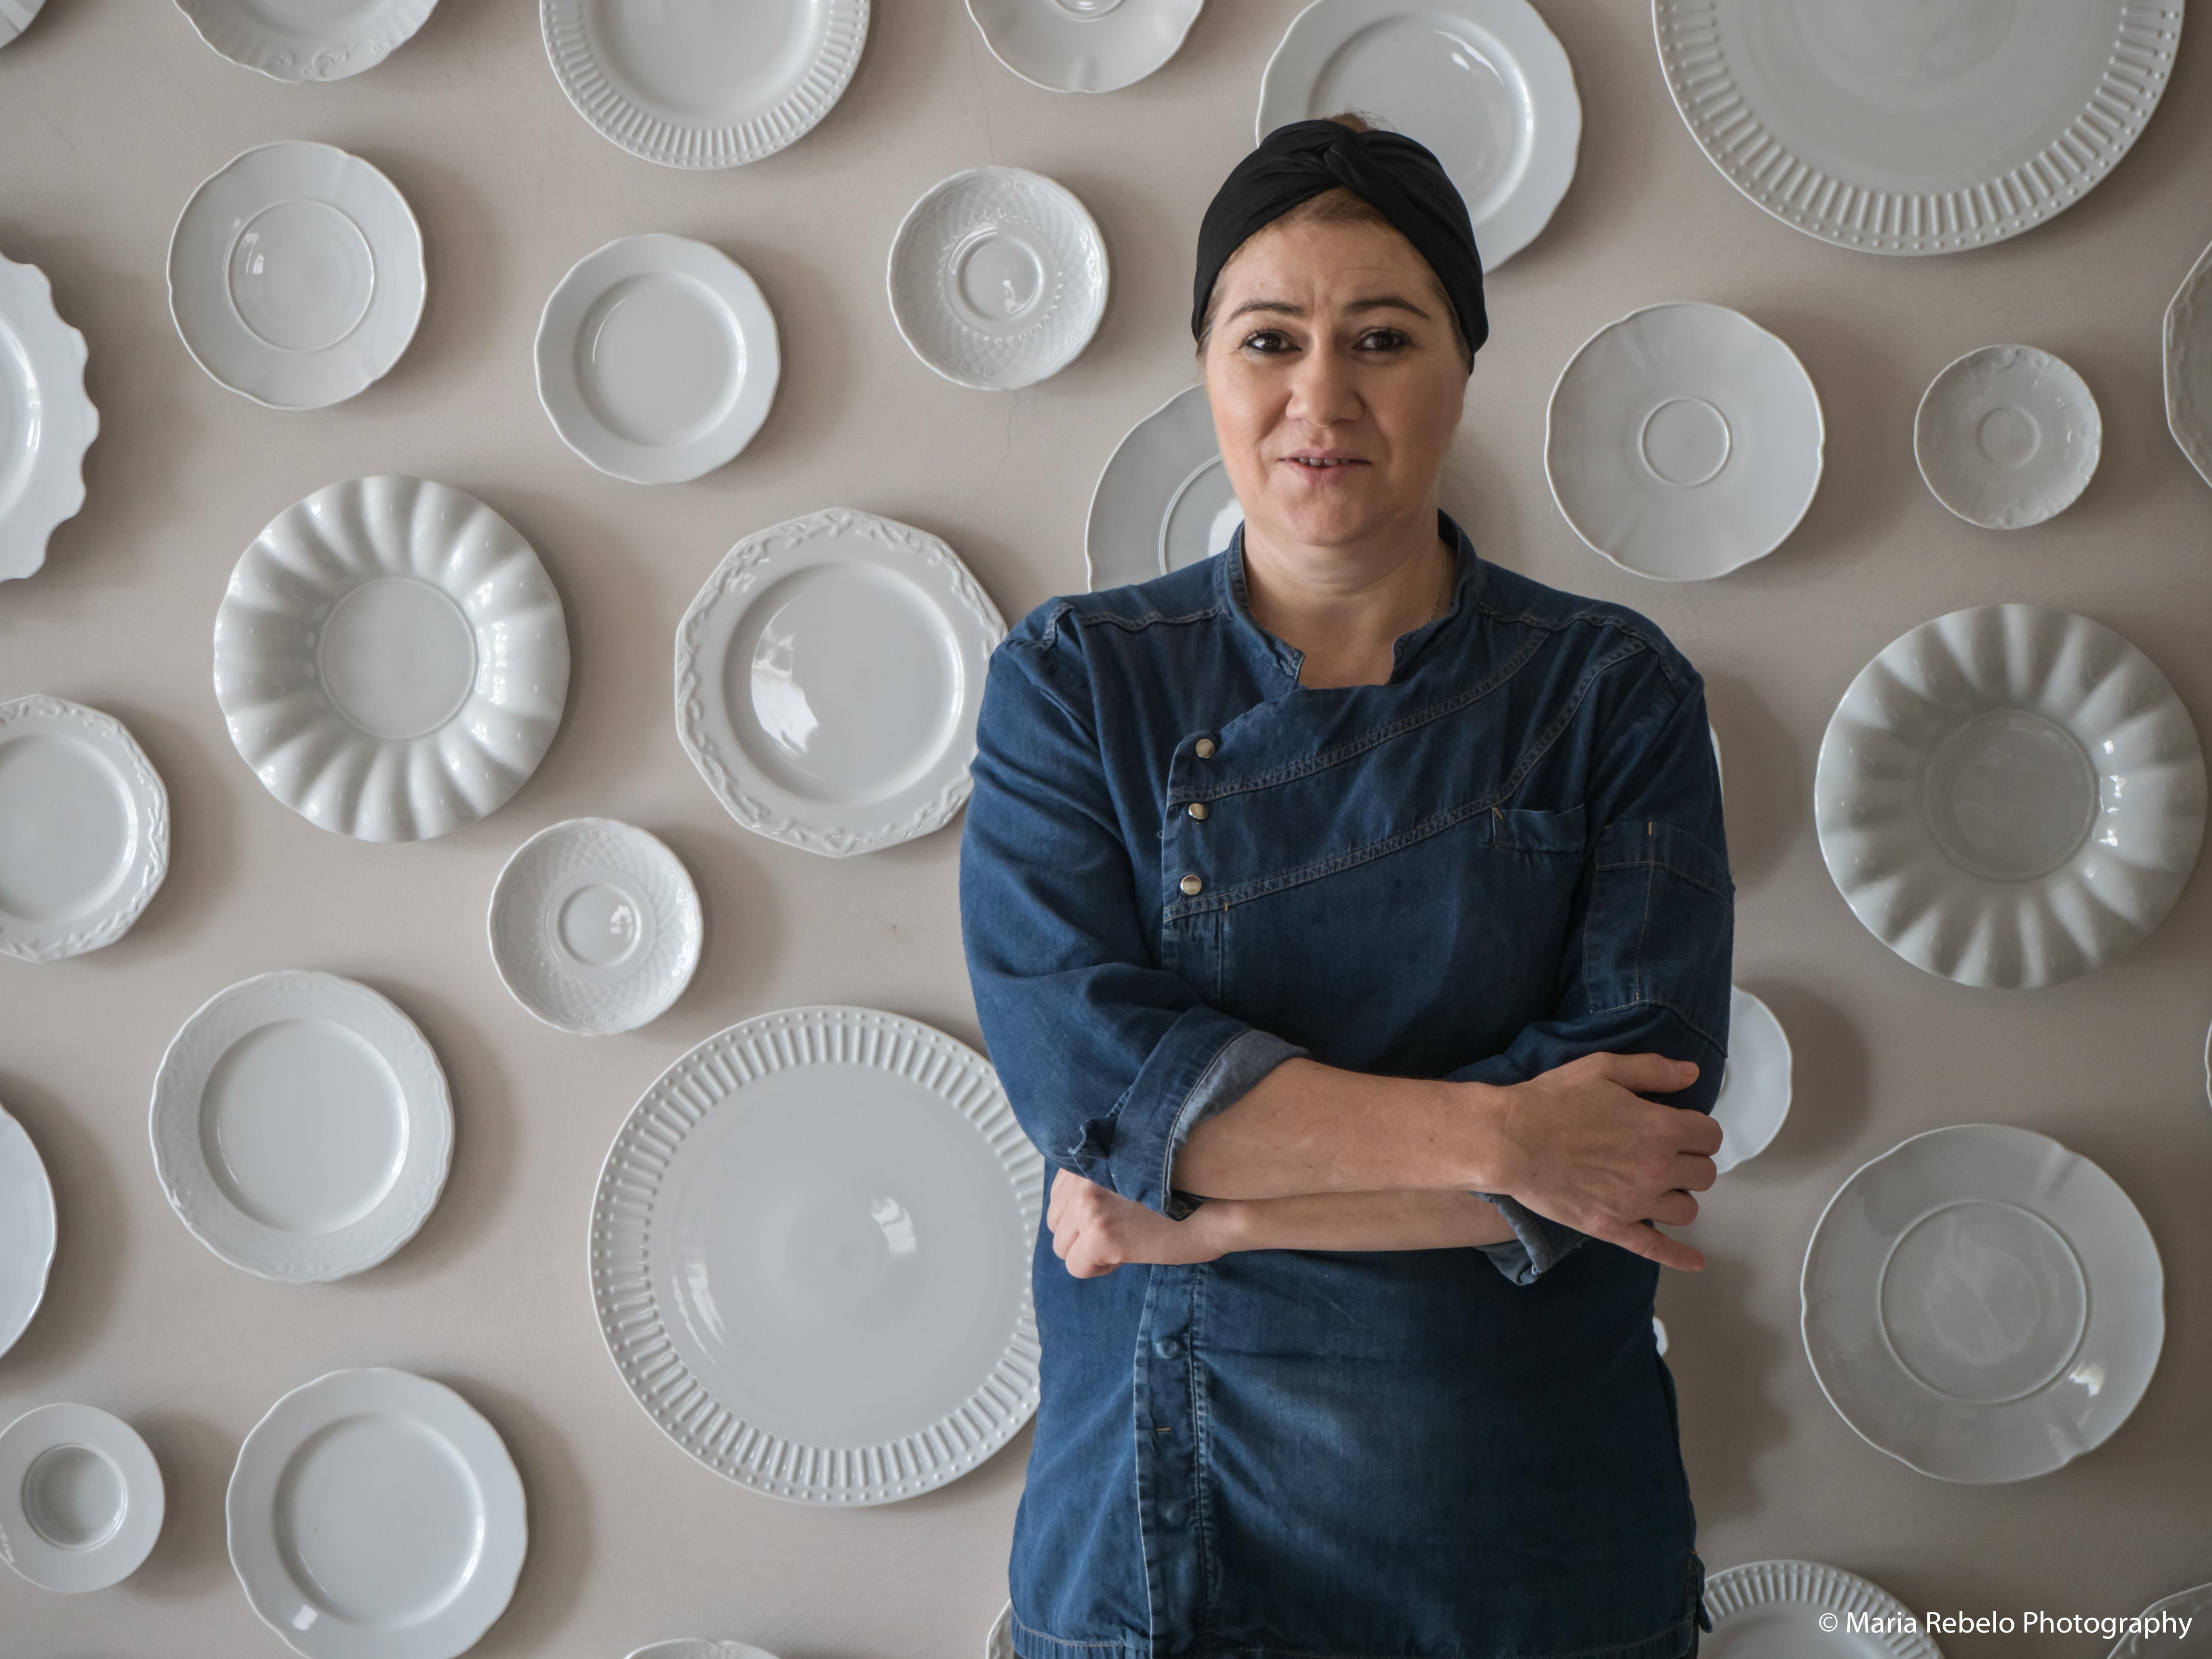 16 - Chefe Cristina Almeida - @mariarebelophotography.com